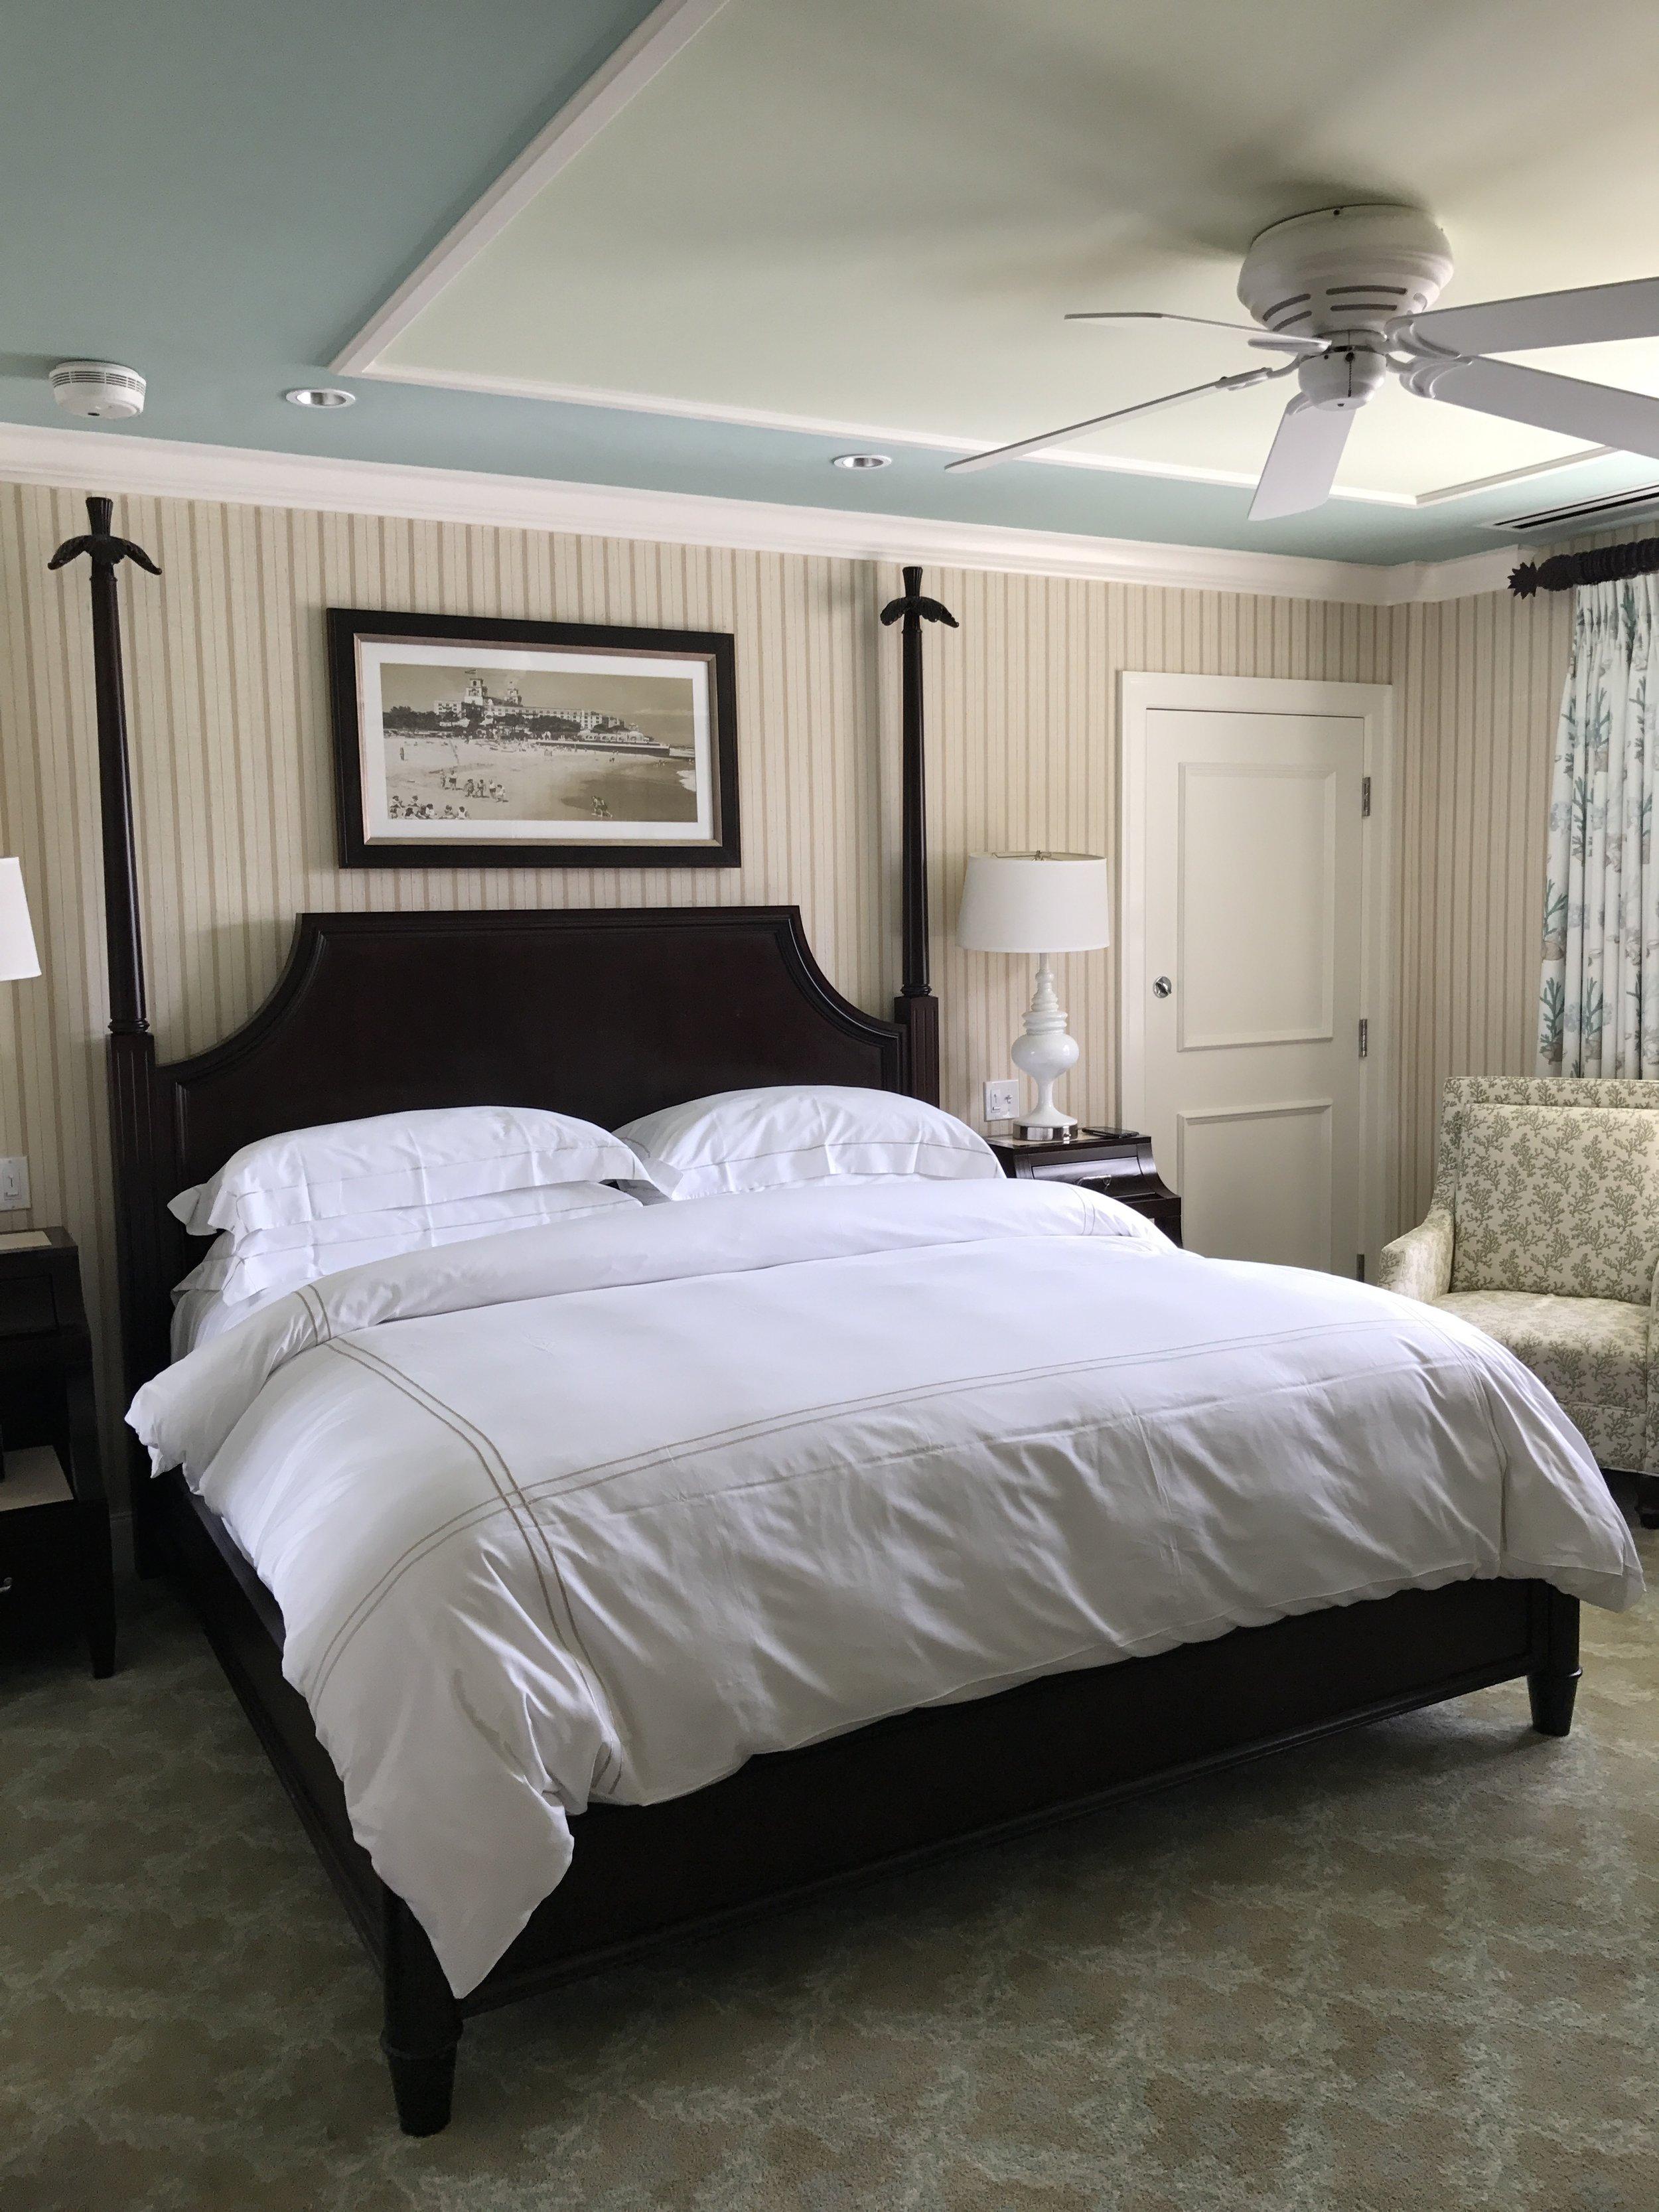 thebreakers-review-king-hotel-room.jpg